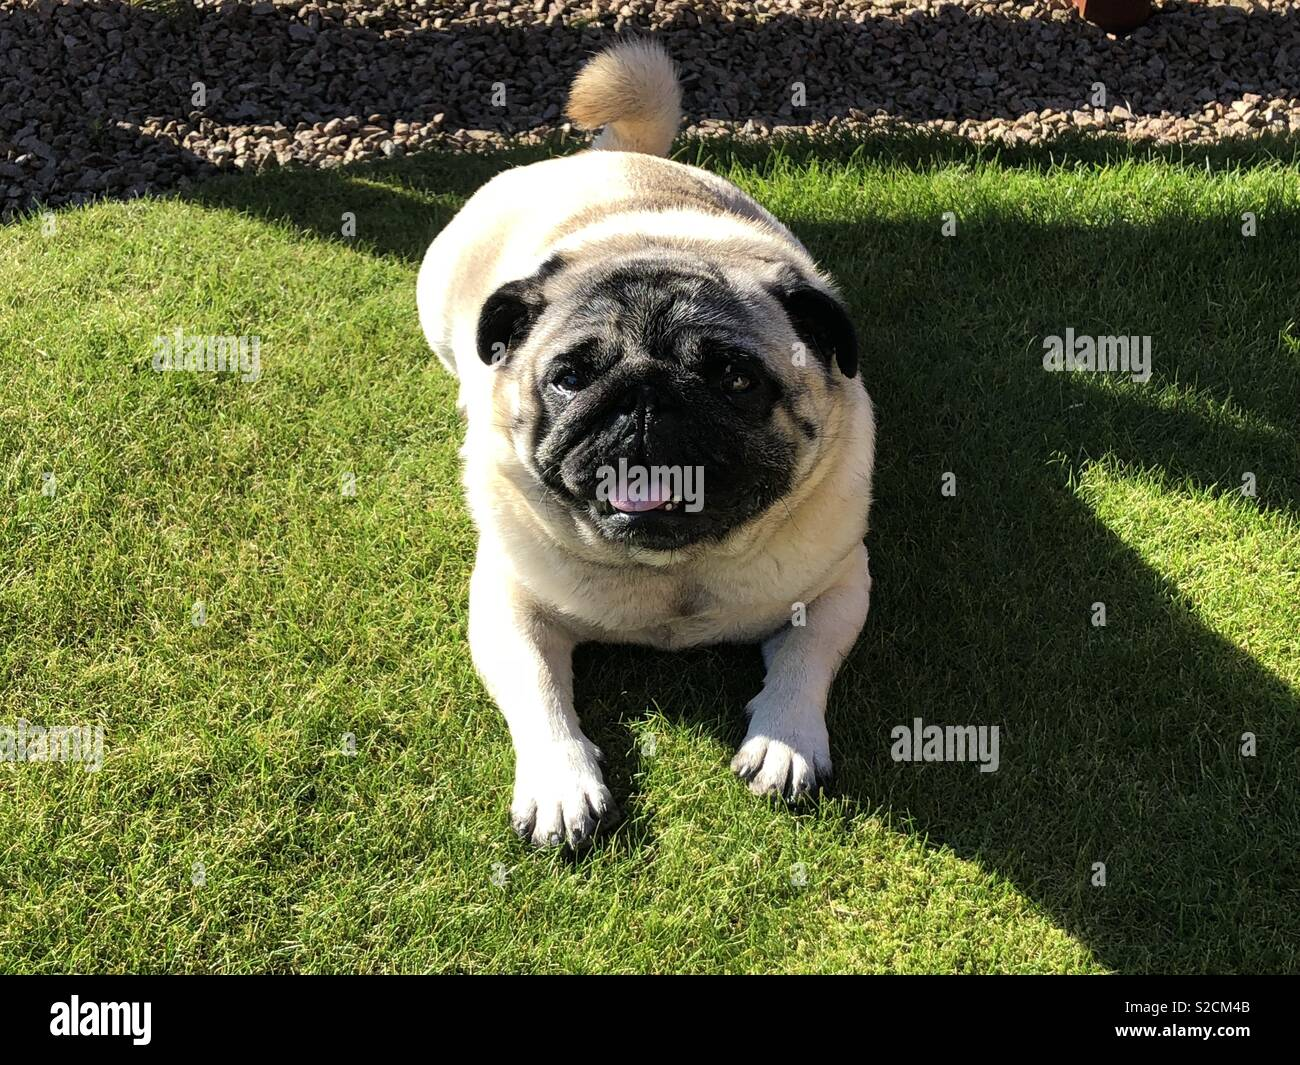 Sunbathing pugster - Stock Image